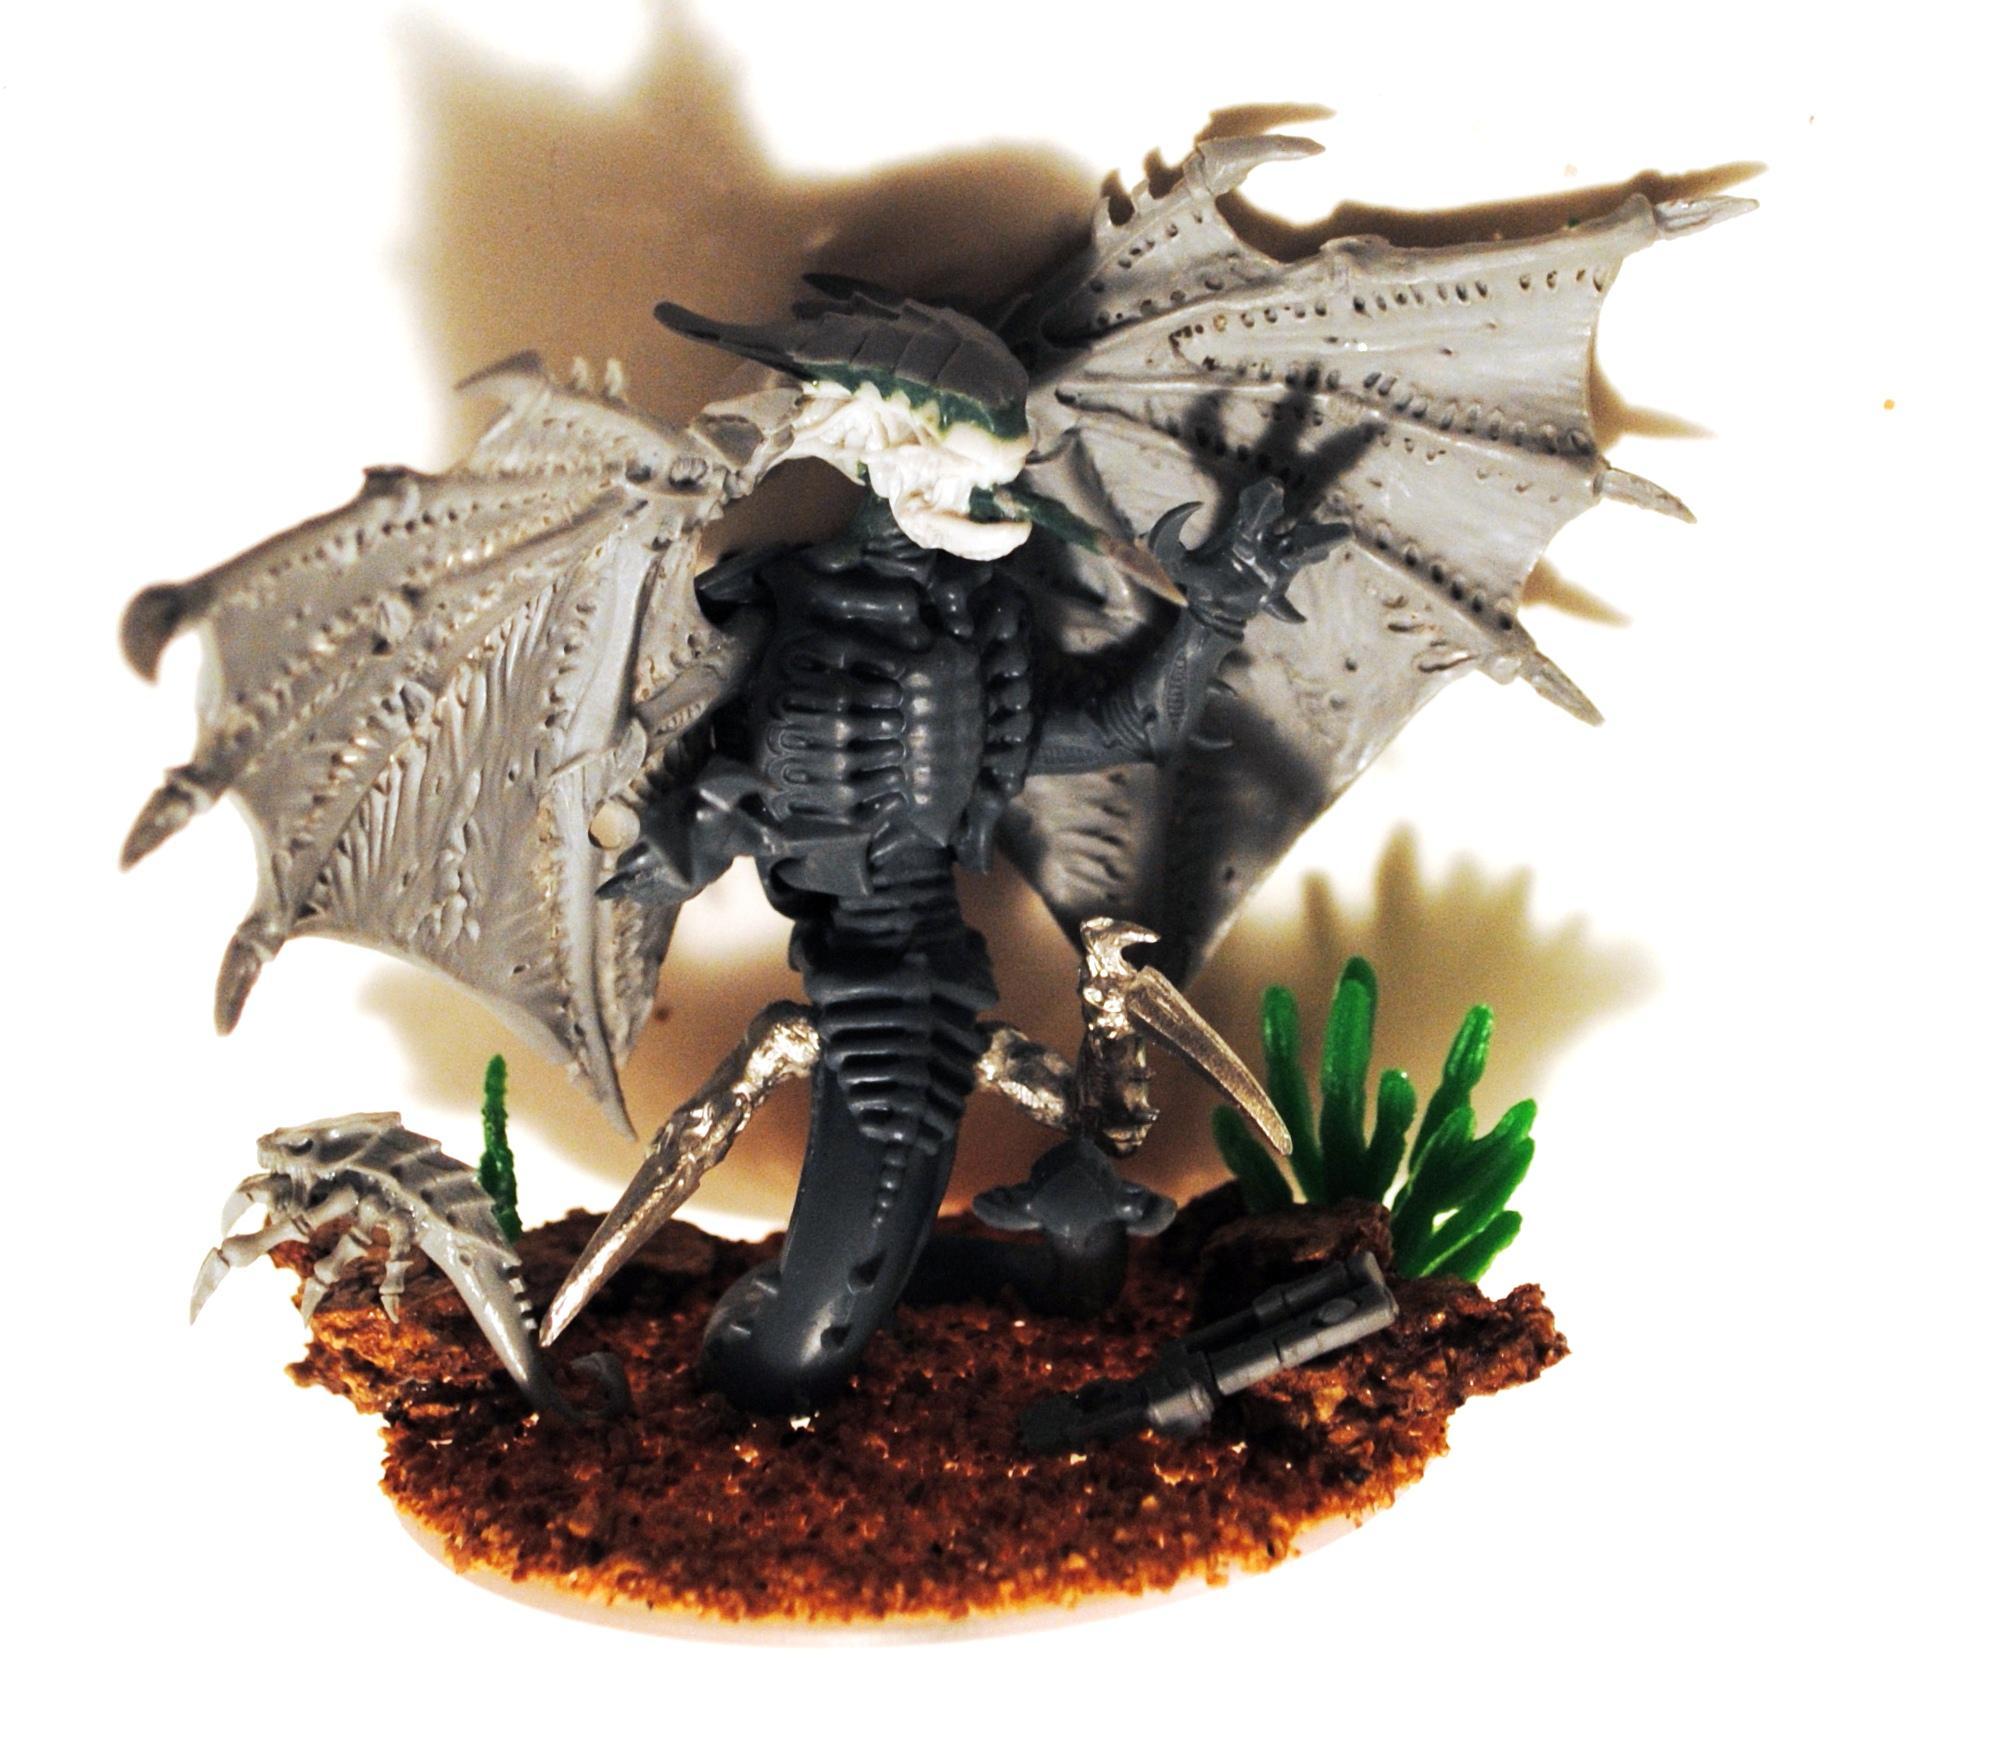 Conversion, Parasite Of Mortrex, Tyranids, Warhammer 40,000, Work In Progress